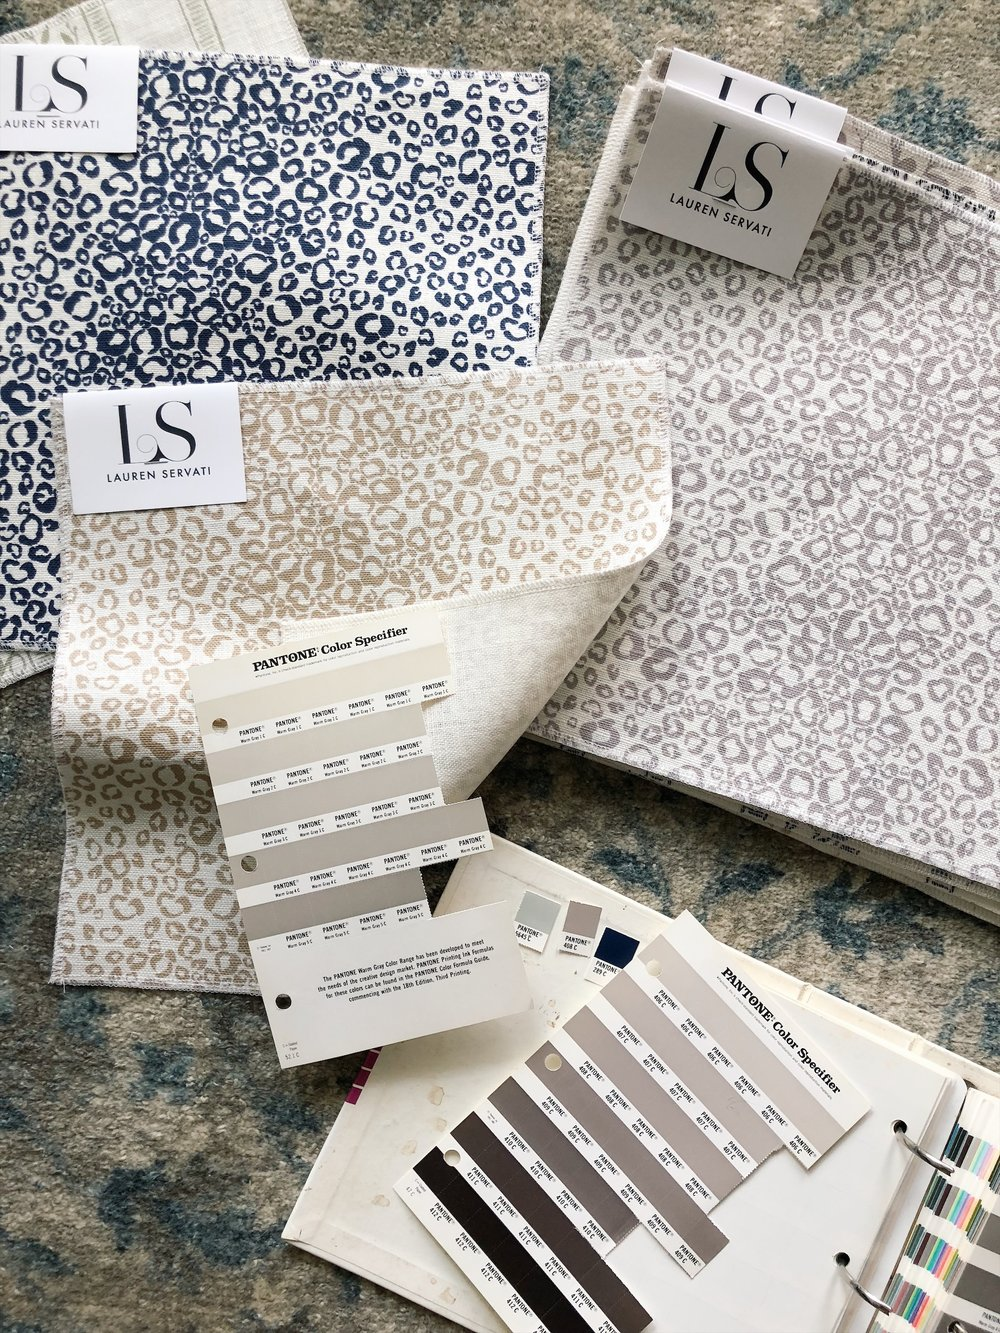 Lauren Servati Textiles, Small Batch Textiles